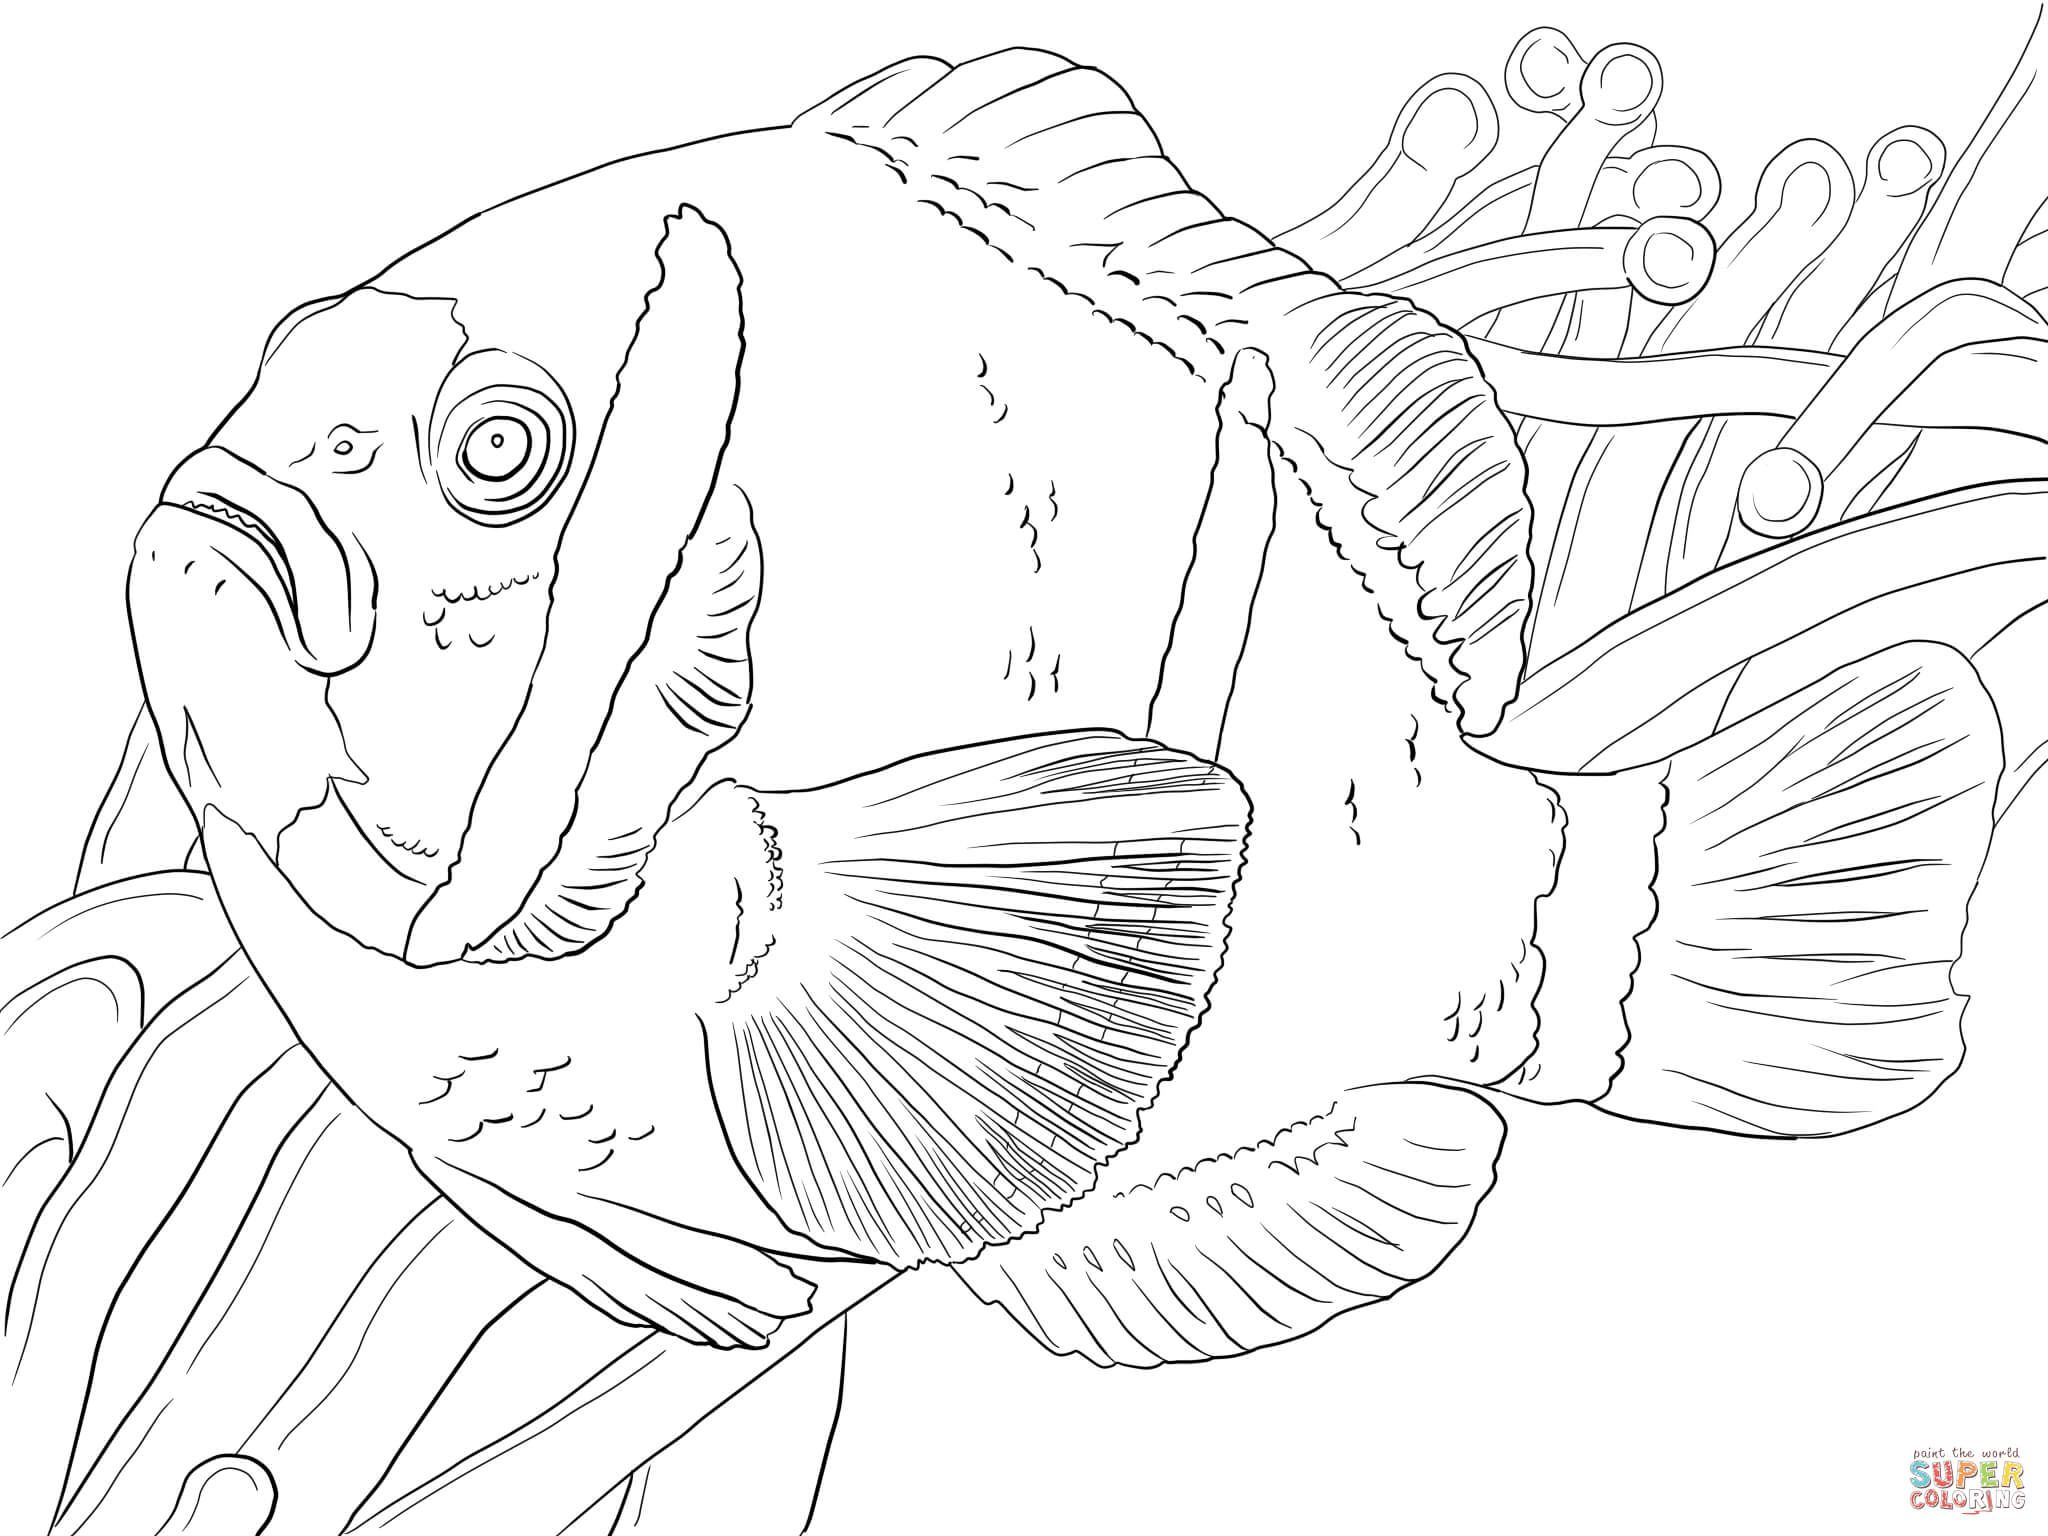 anemone fish | Fish | Pinterest